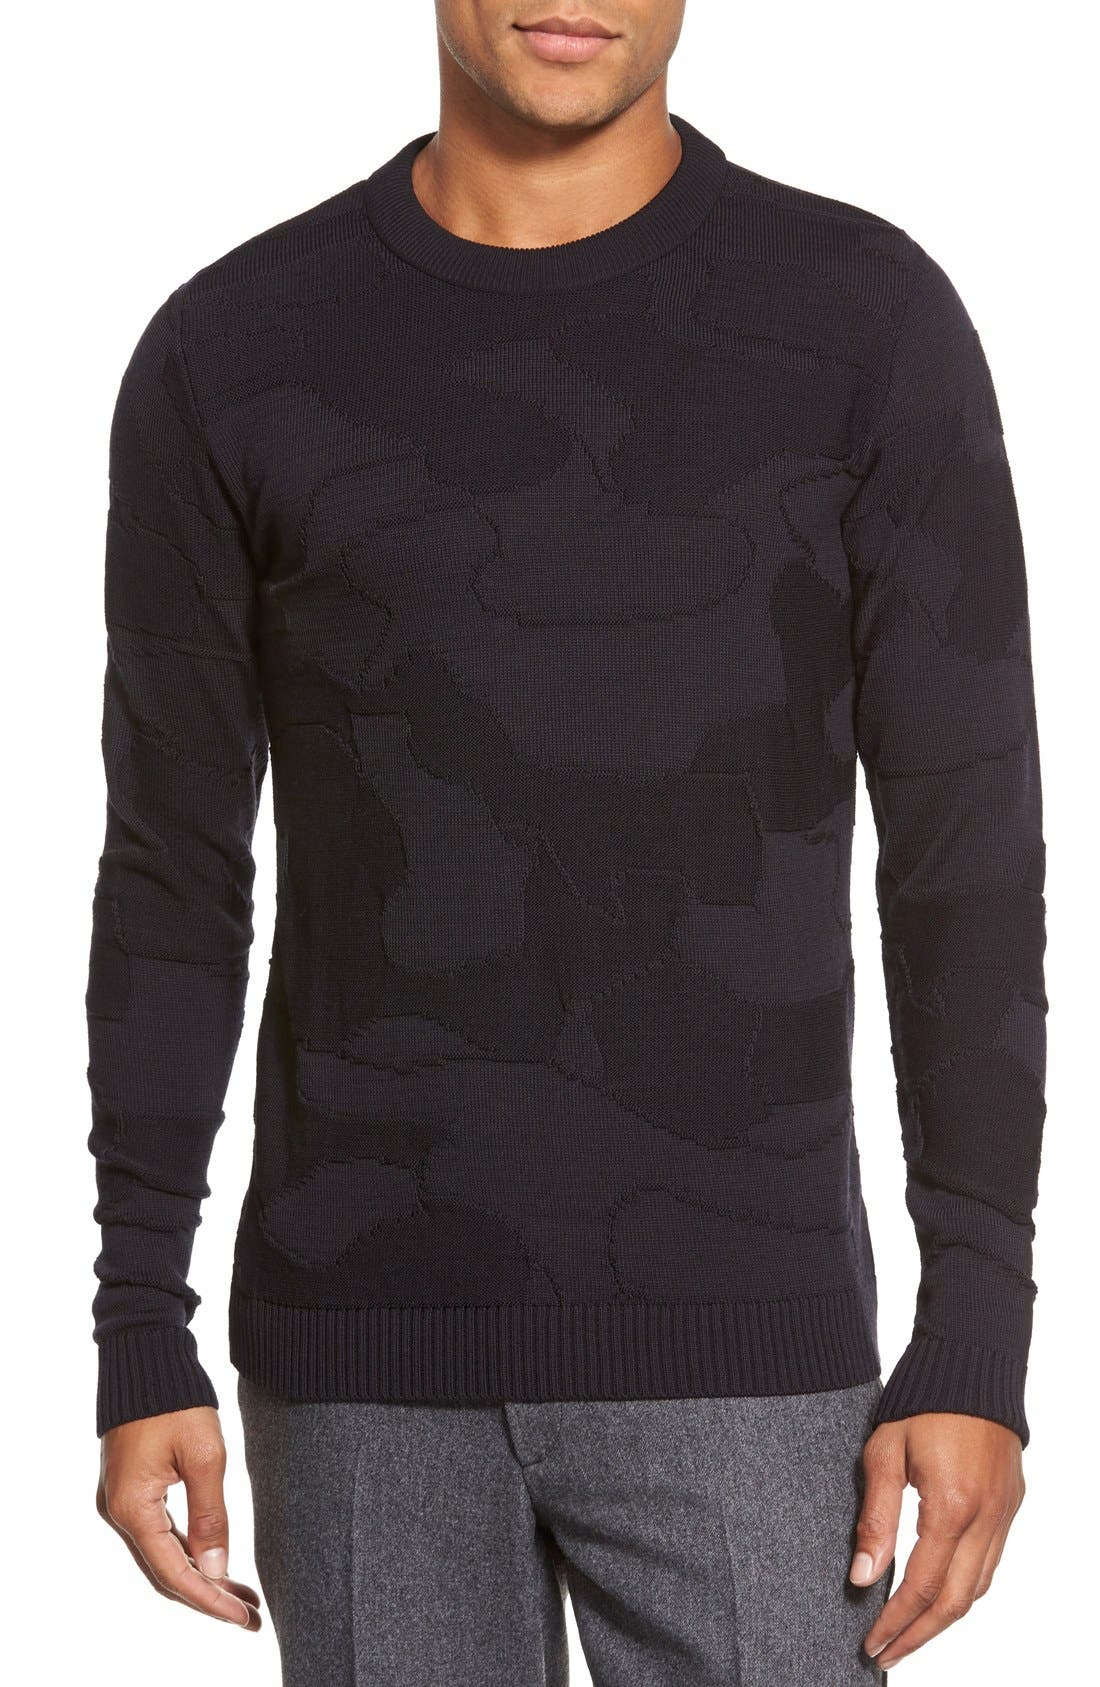 'Codon' Slim Fit Wool Knit Crewneck Sweater, Main, color, 002